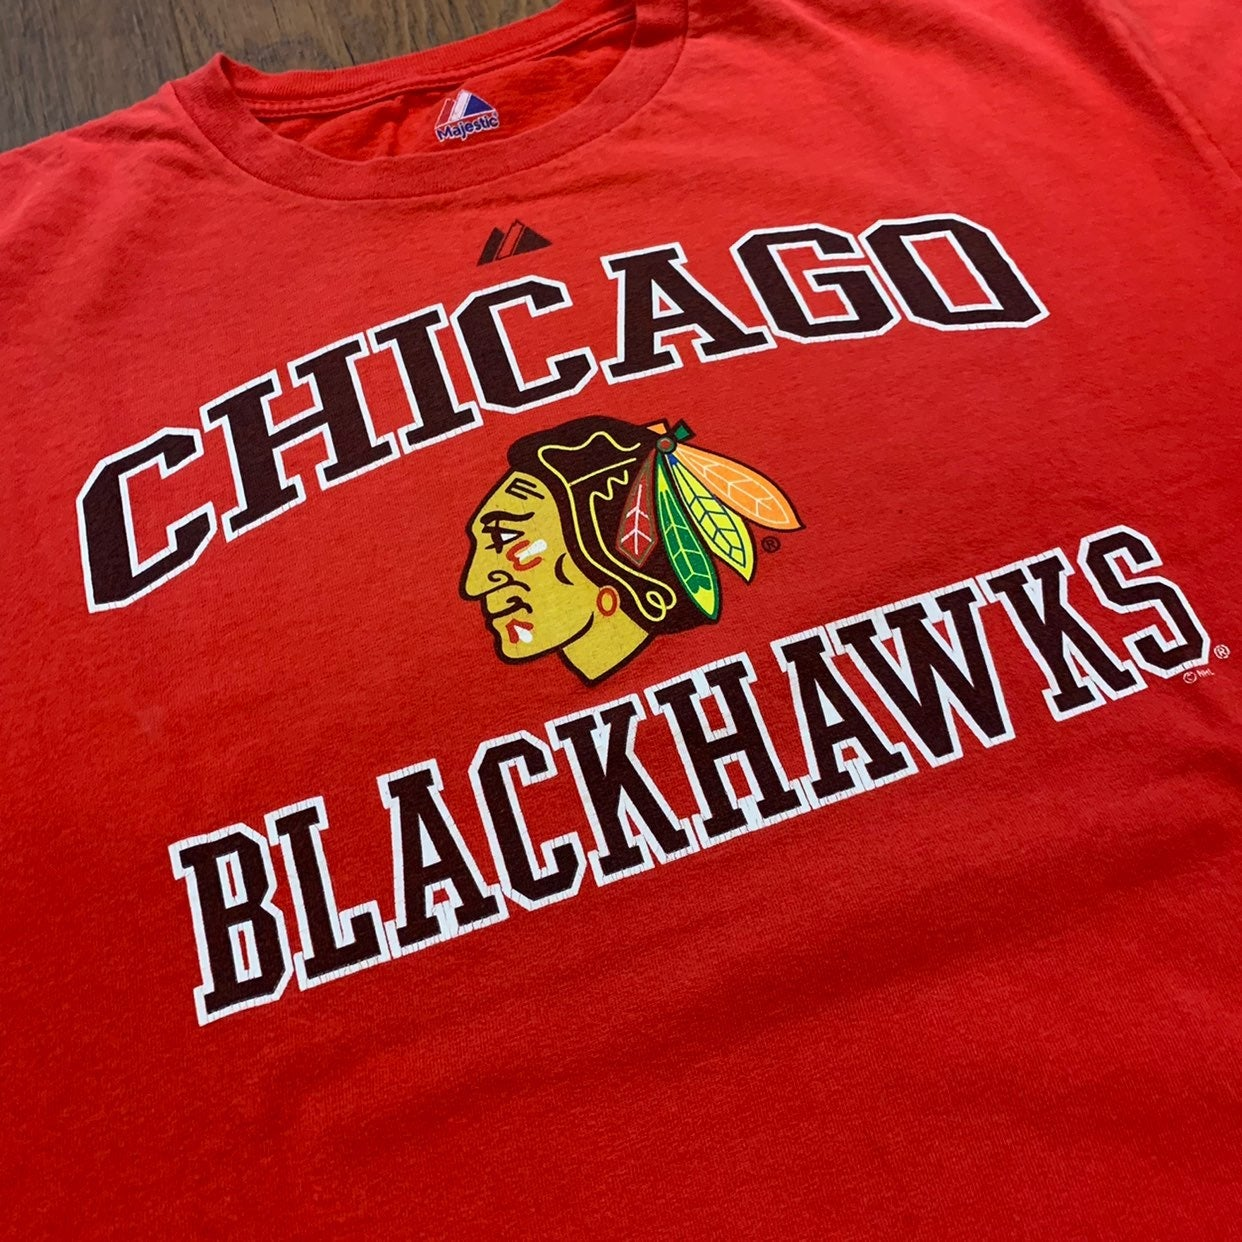 Chicago Blackhawks Hockey T-Shirt